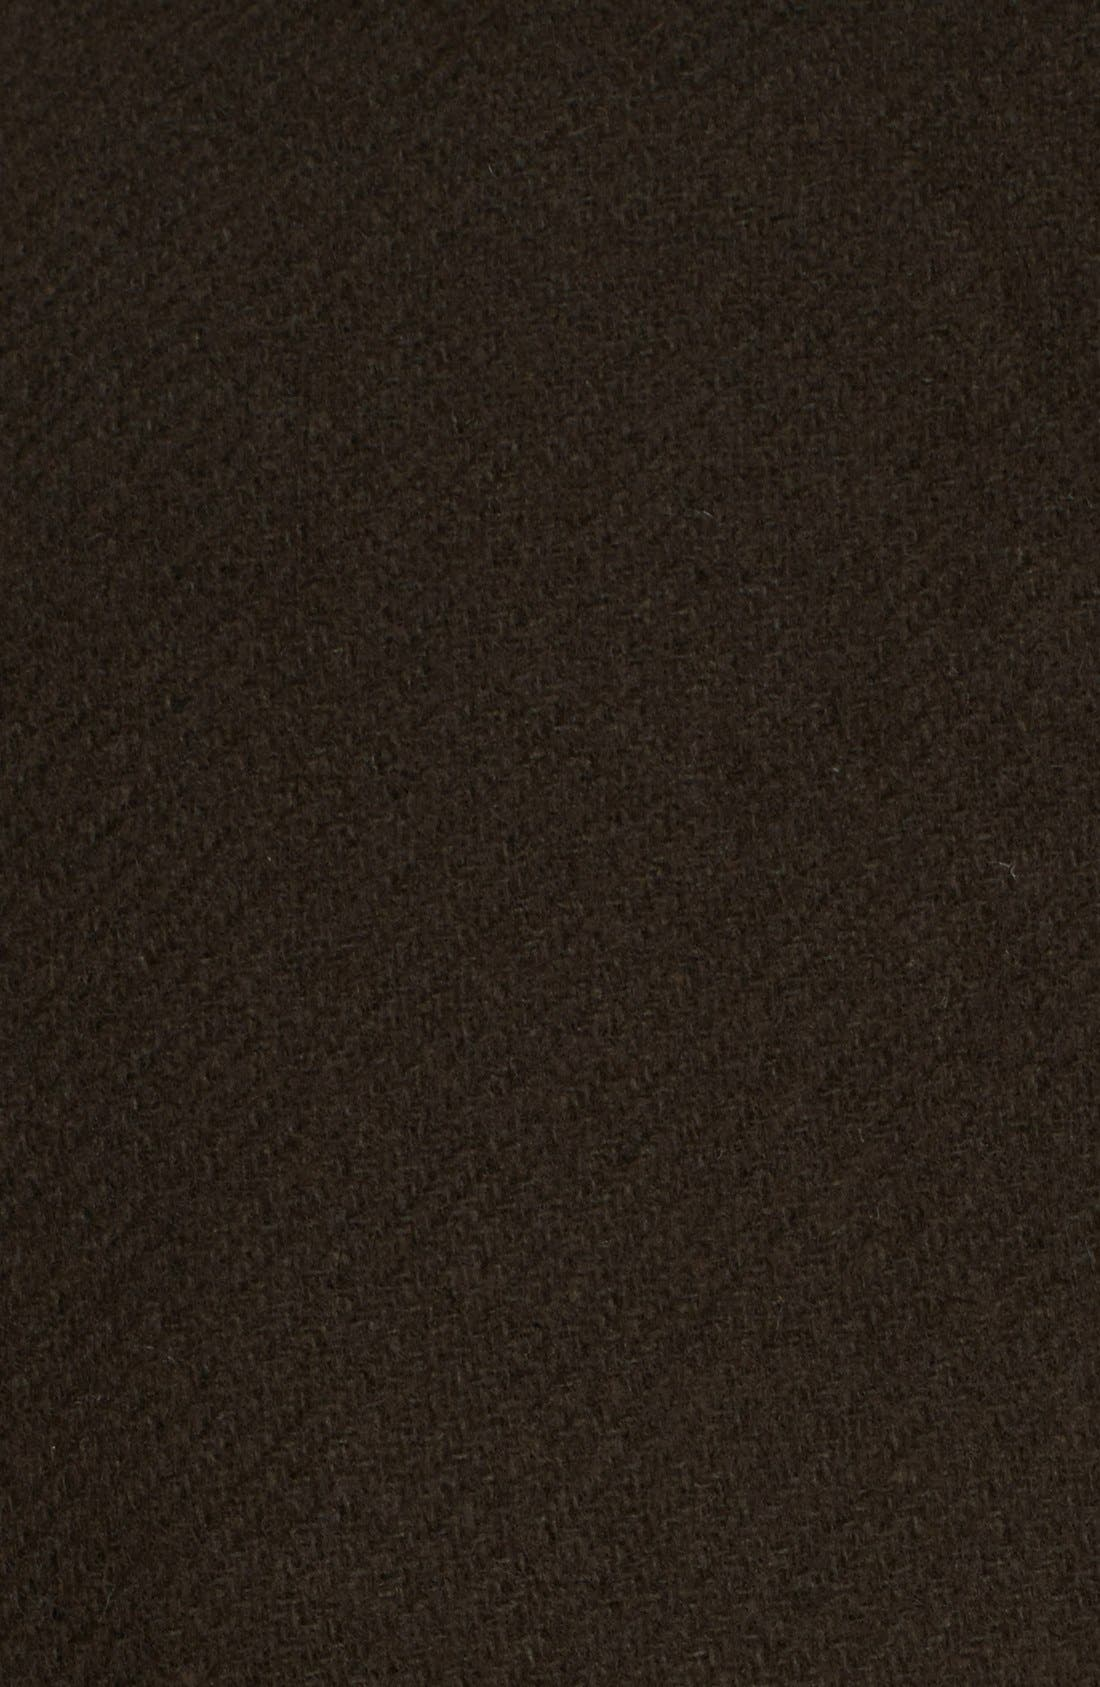 Alternate Image 3  - Burberry Brit 'Warneton' Shearling Collar Coat